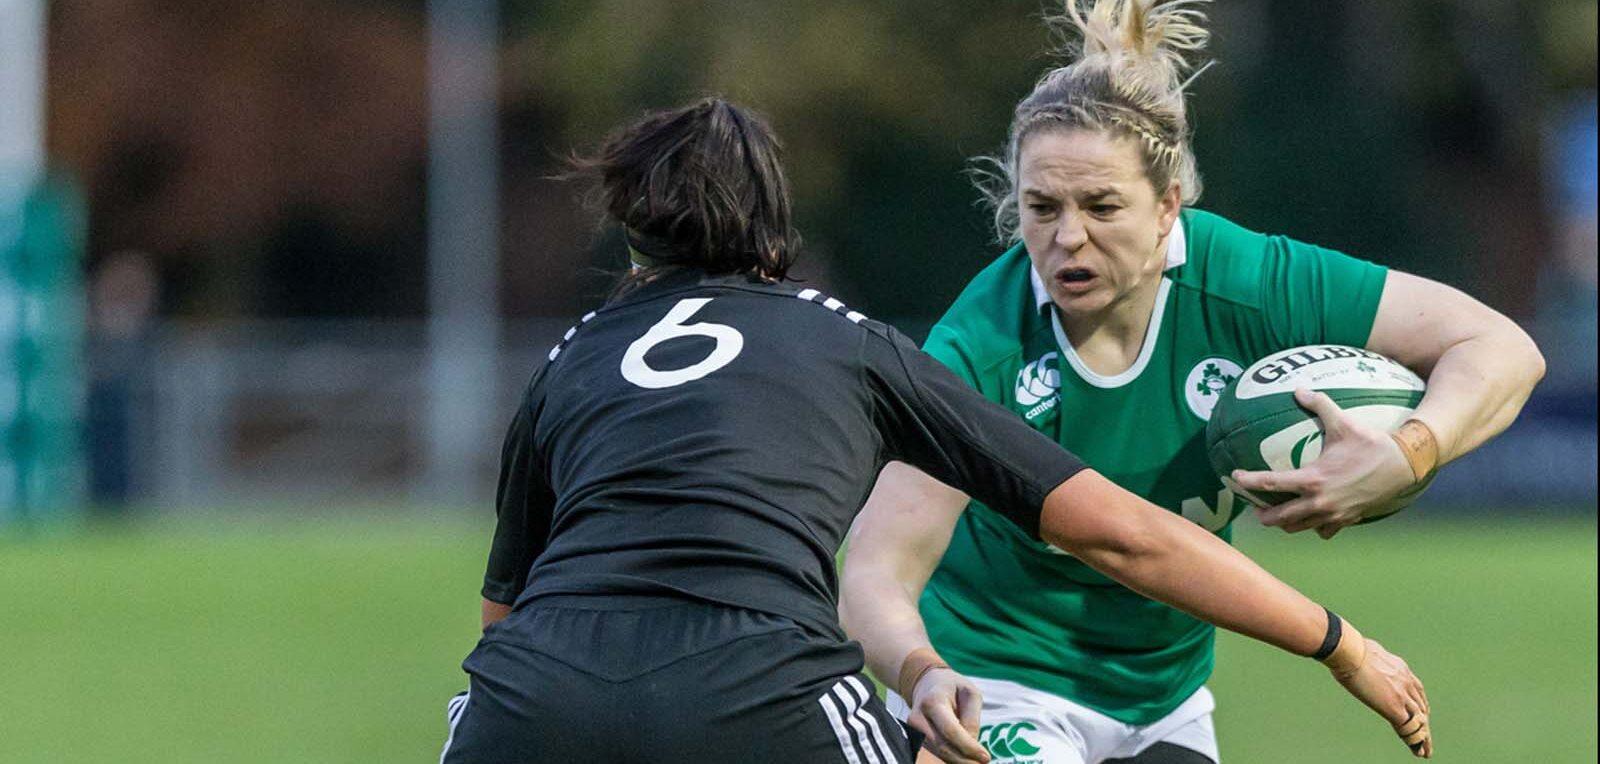 WRWC2017: Ireland captain Briggs withdrawn.